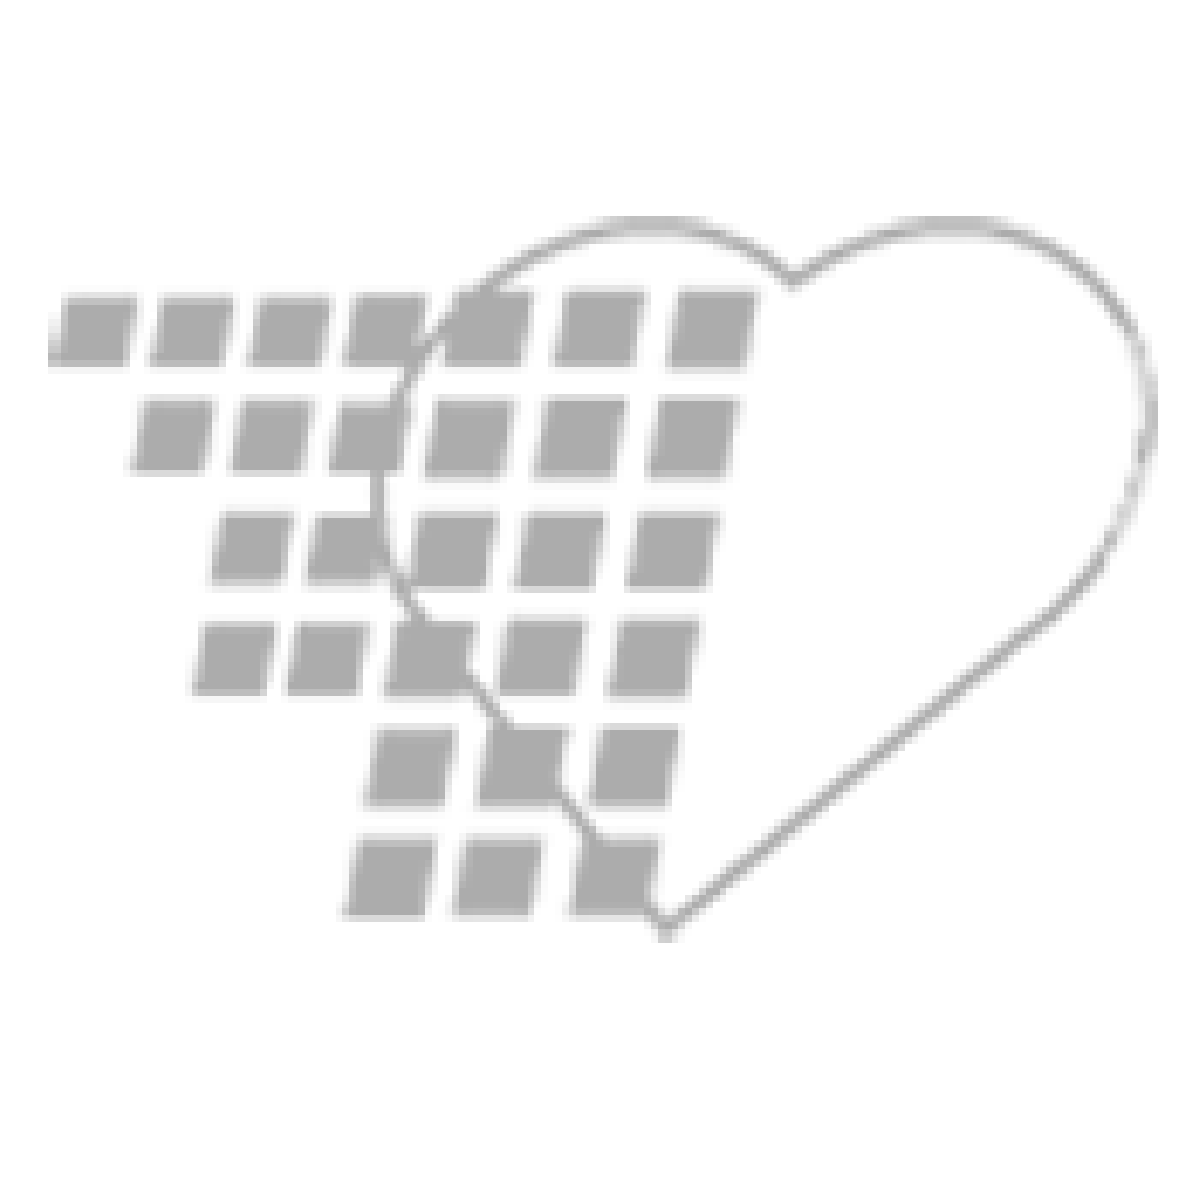 09-31-9796 Urinary Tract Chart